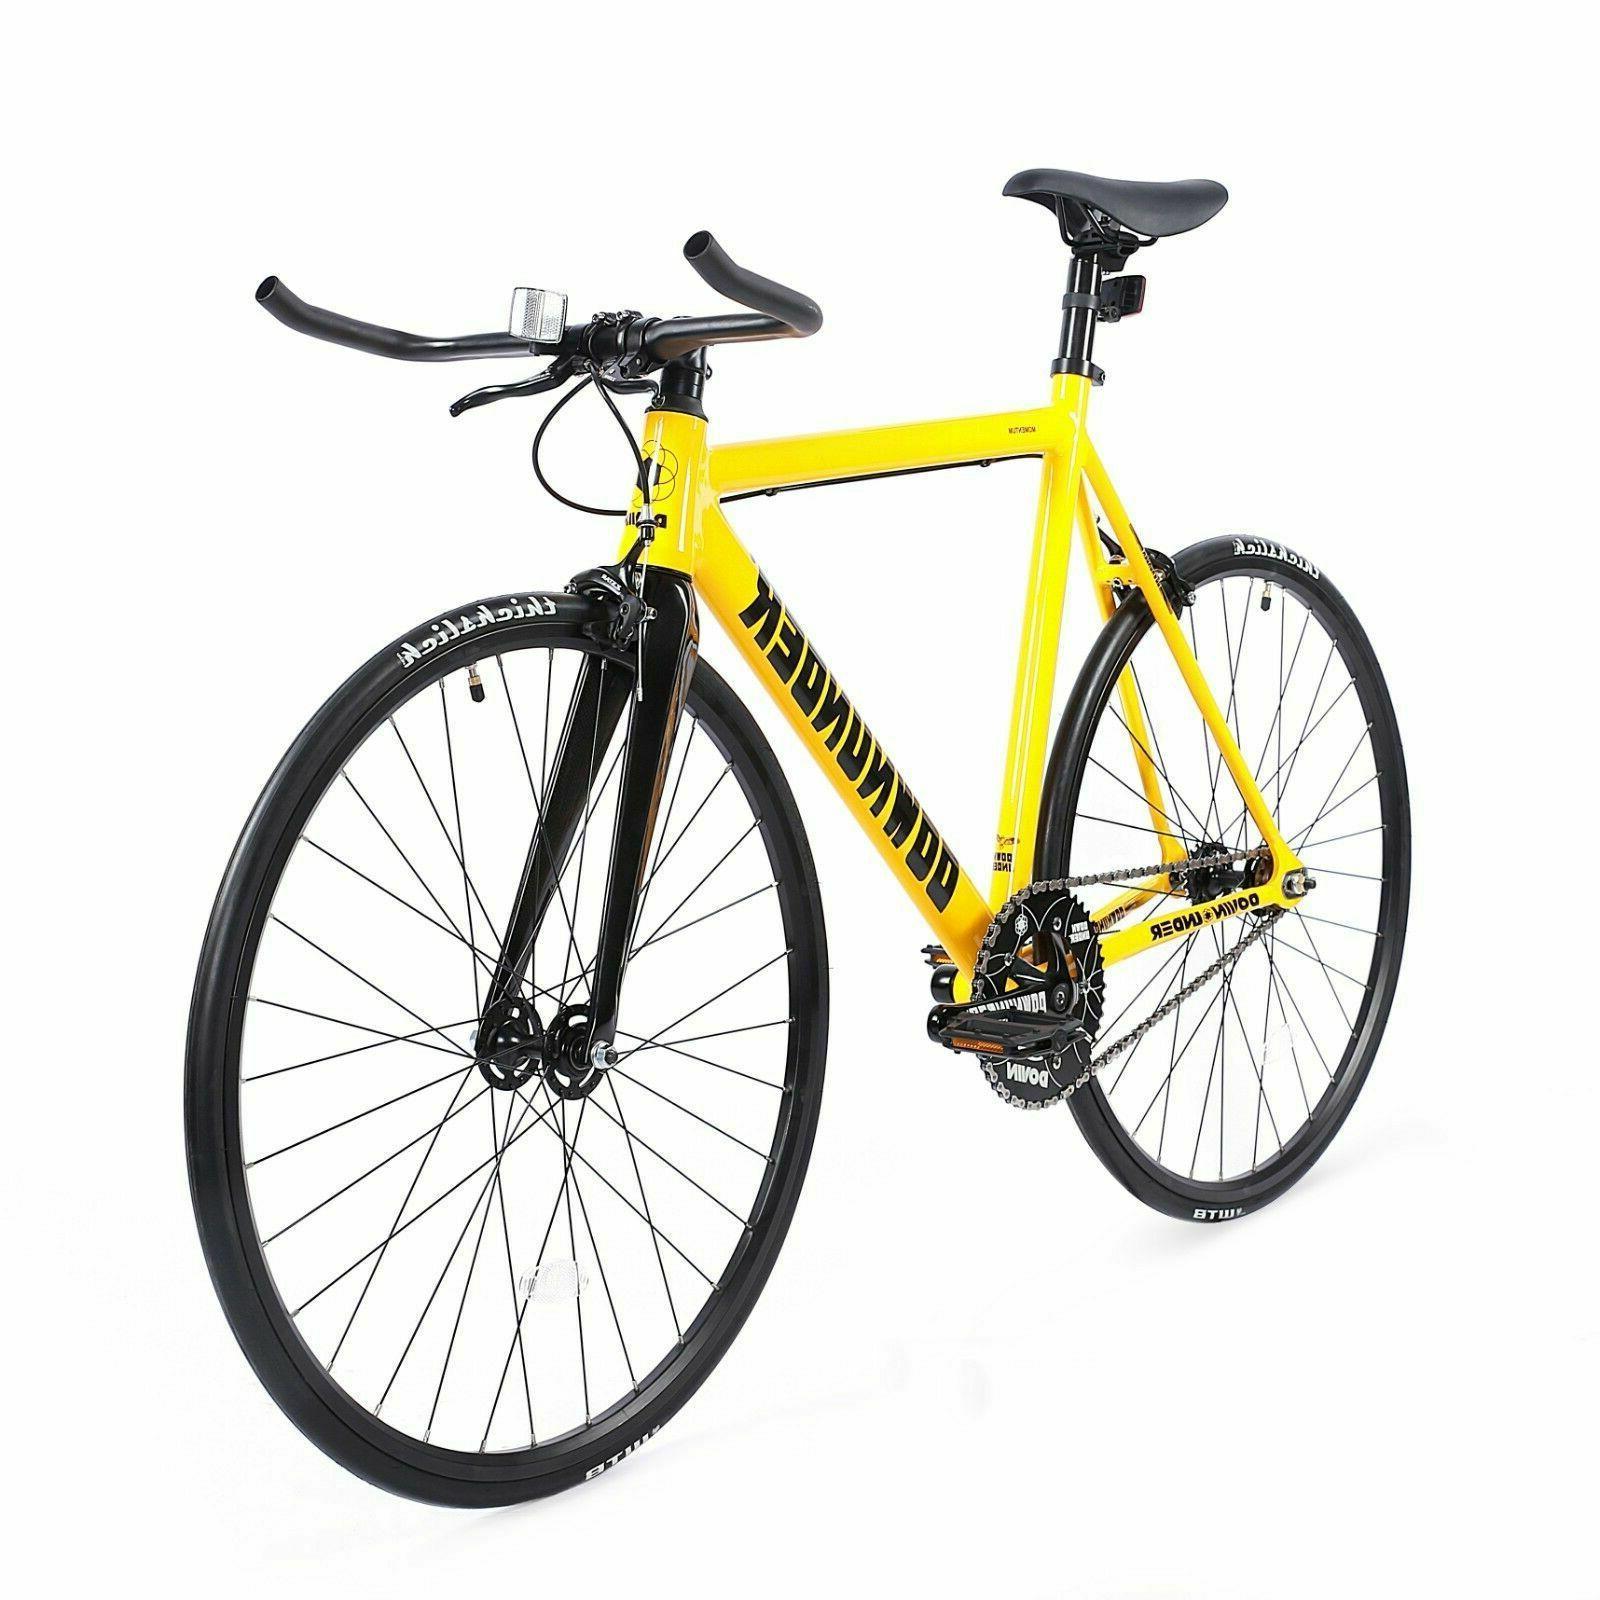 fixed gear bike 700c carbon fiber yellow